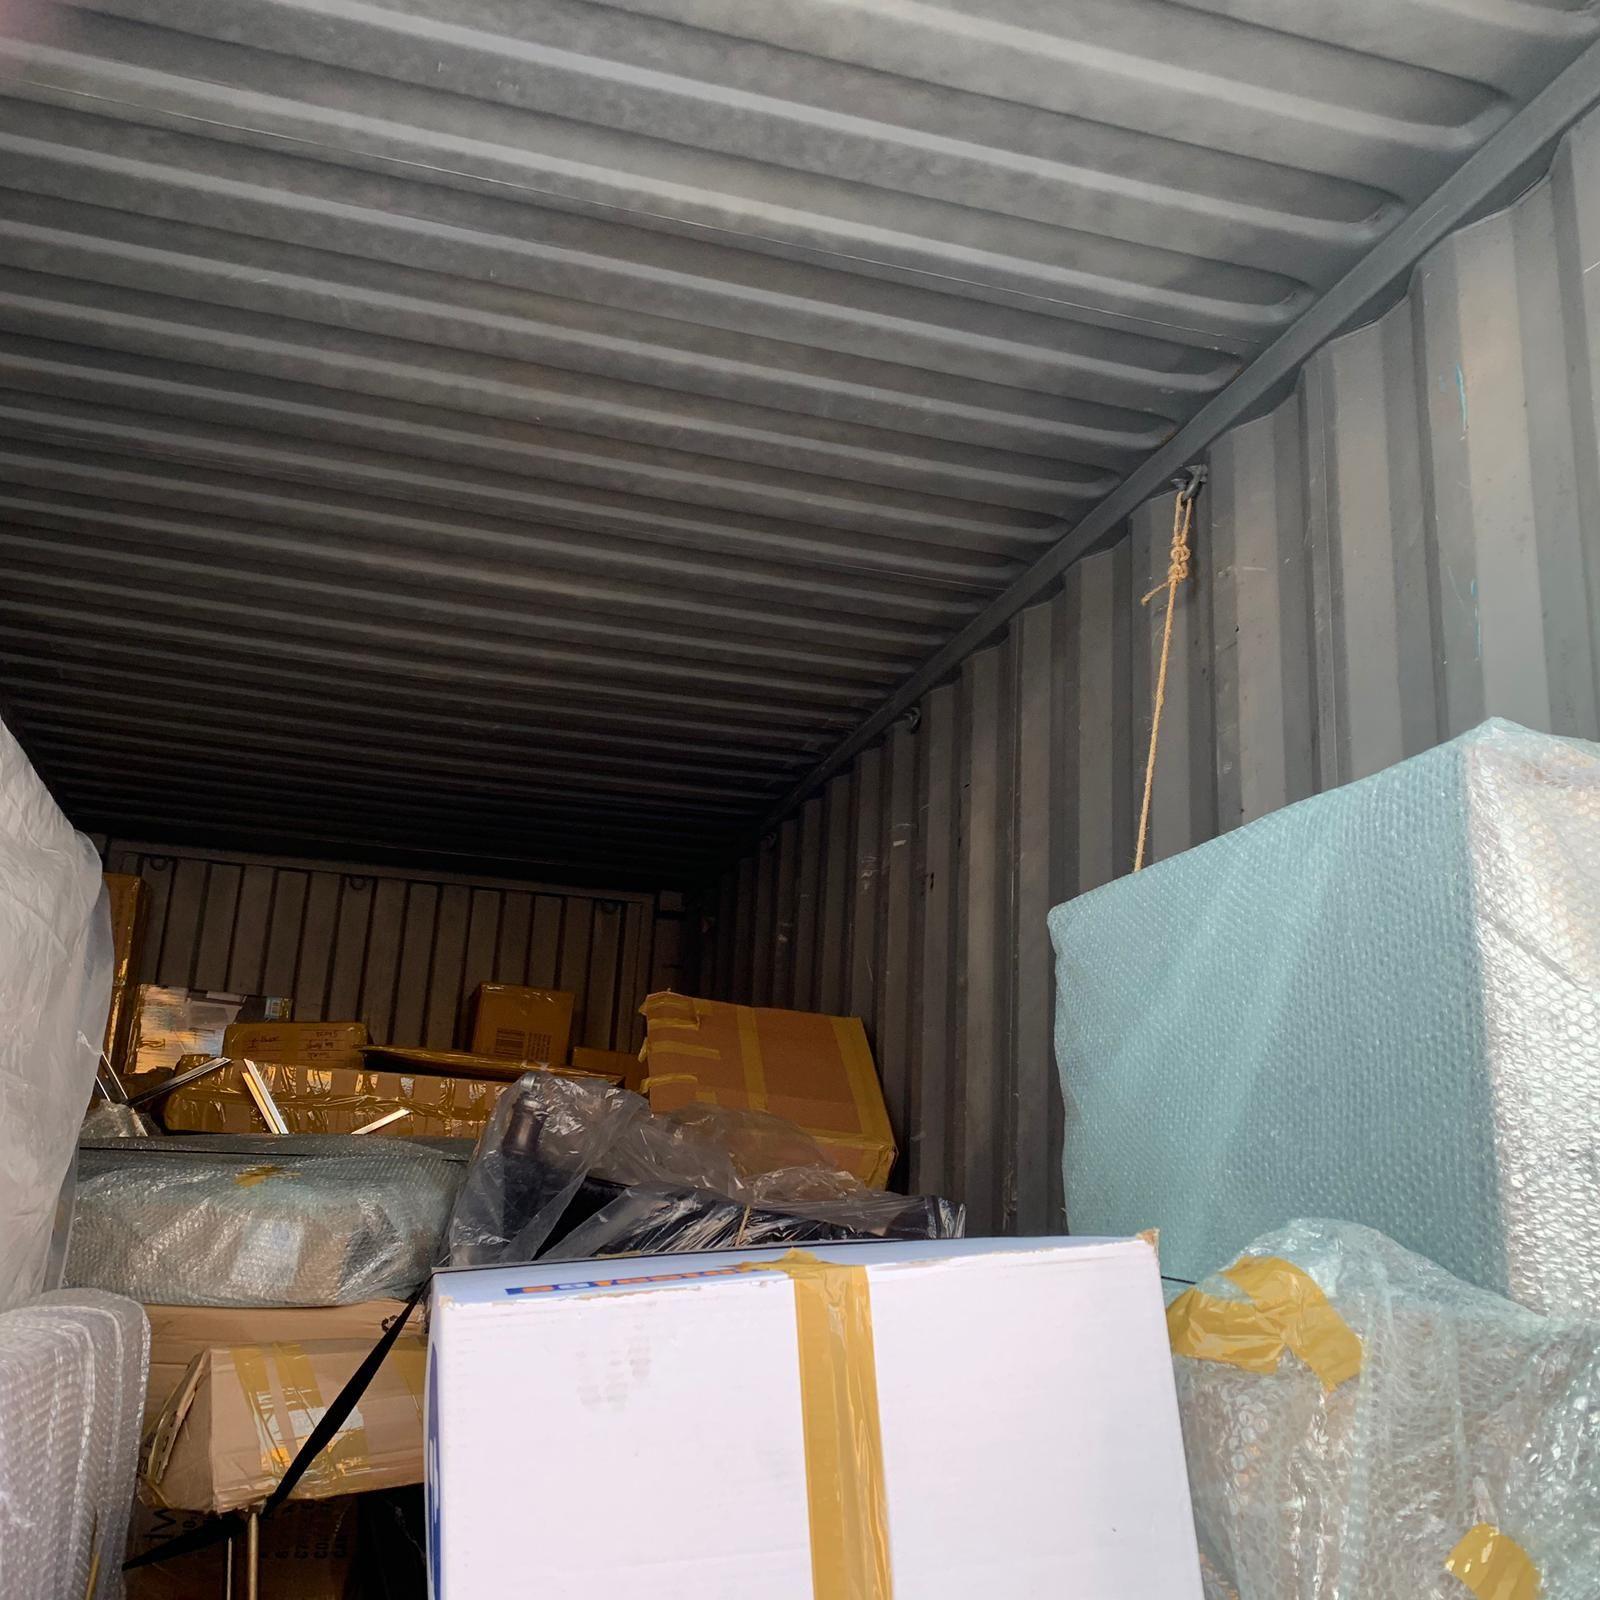 Sea Cargo Services to Pakistan India Cargo services